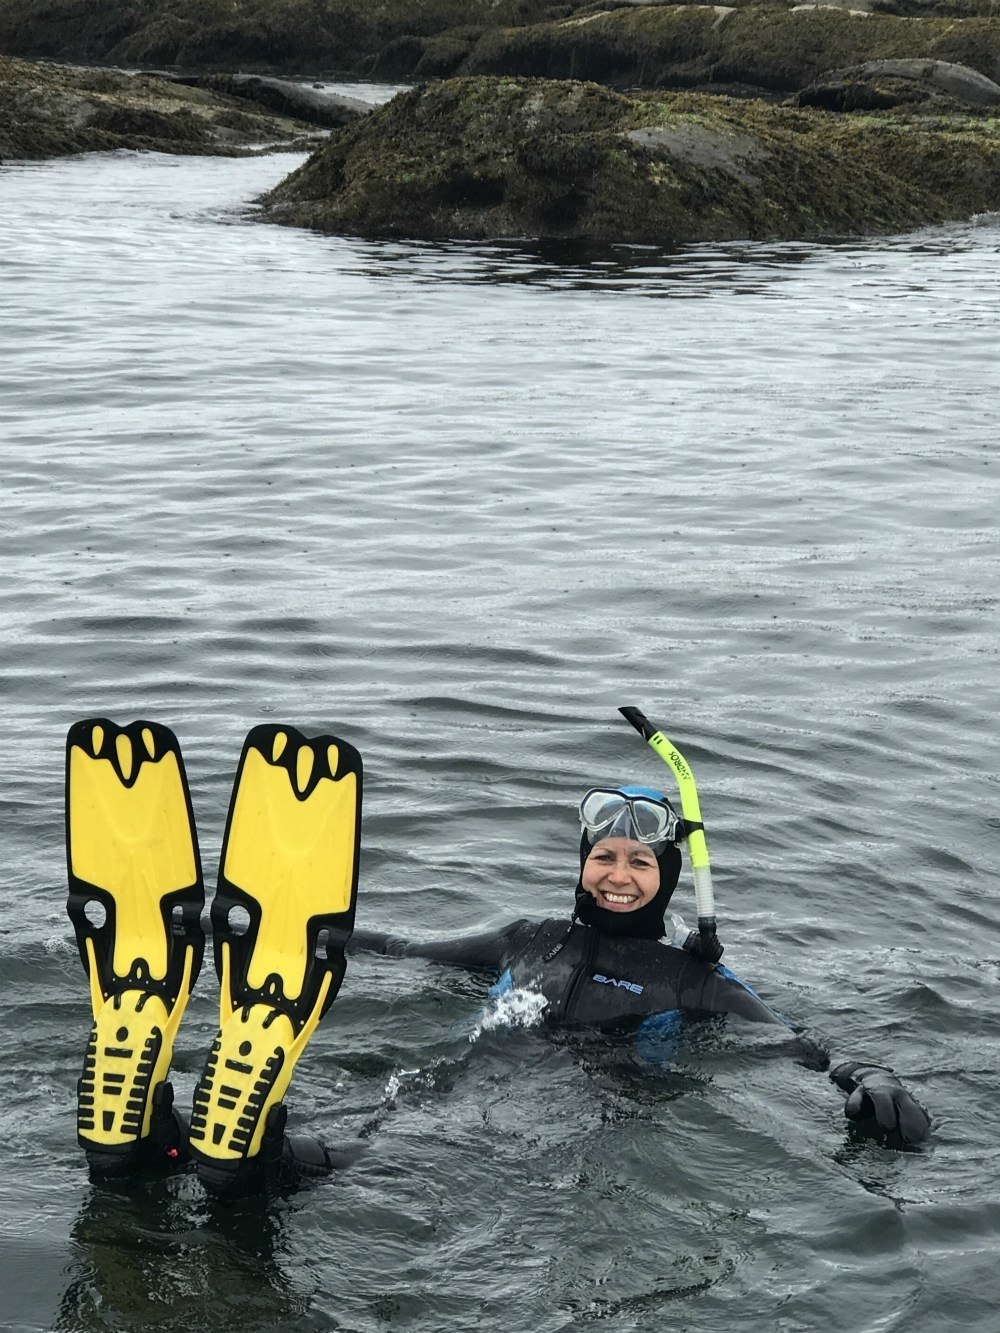 Snorkeling with seals in Nanaimo Photo: Heatheronhertravels.com